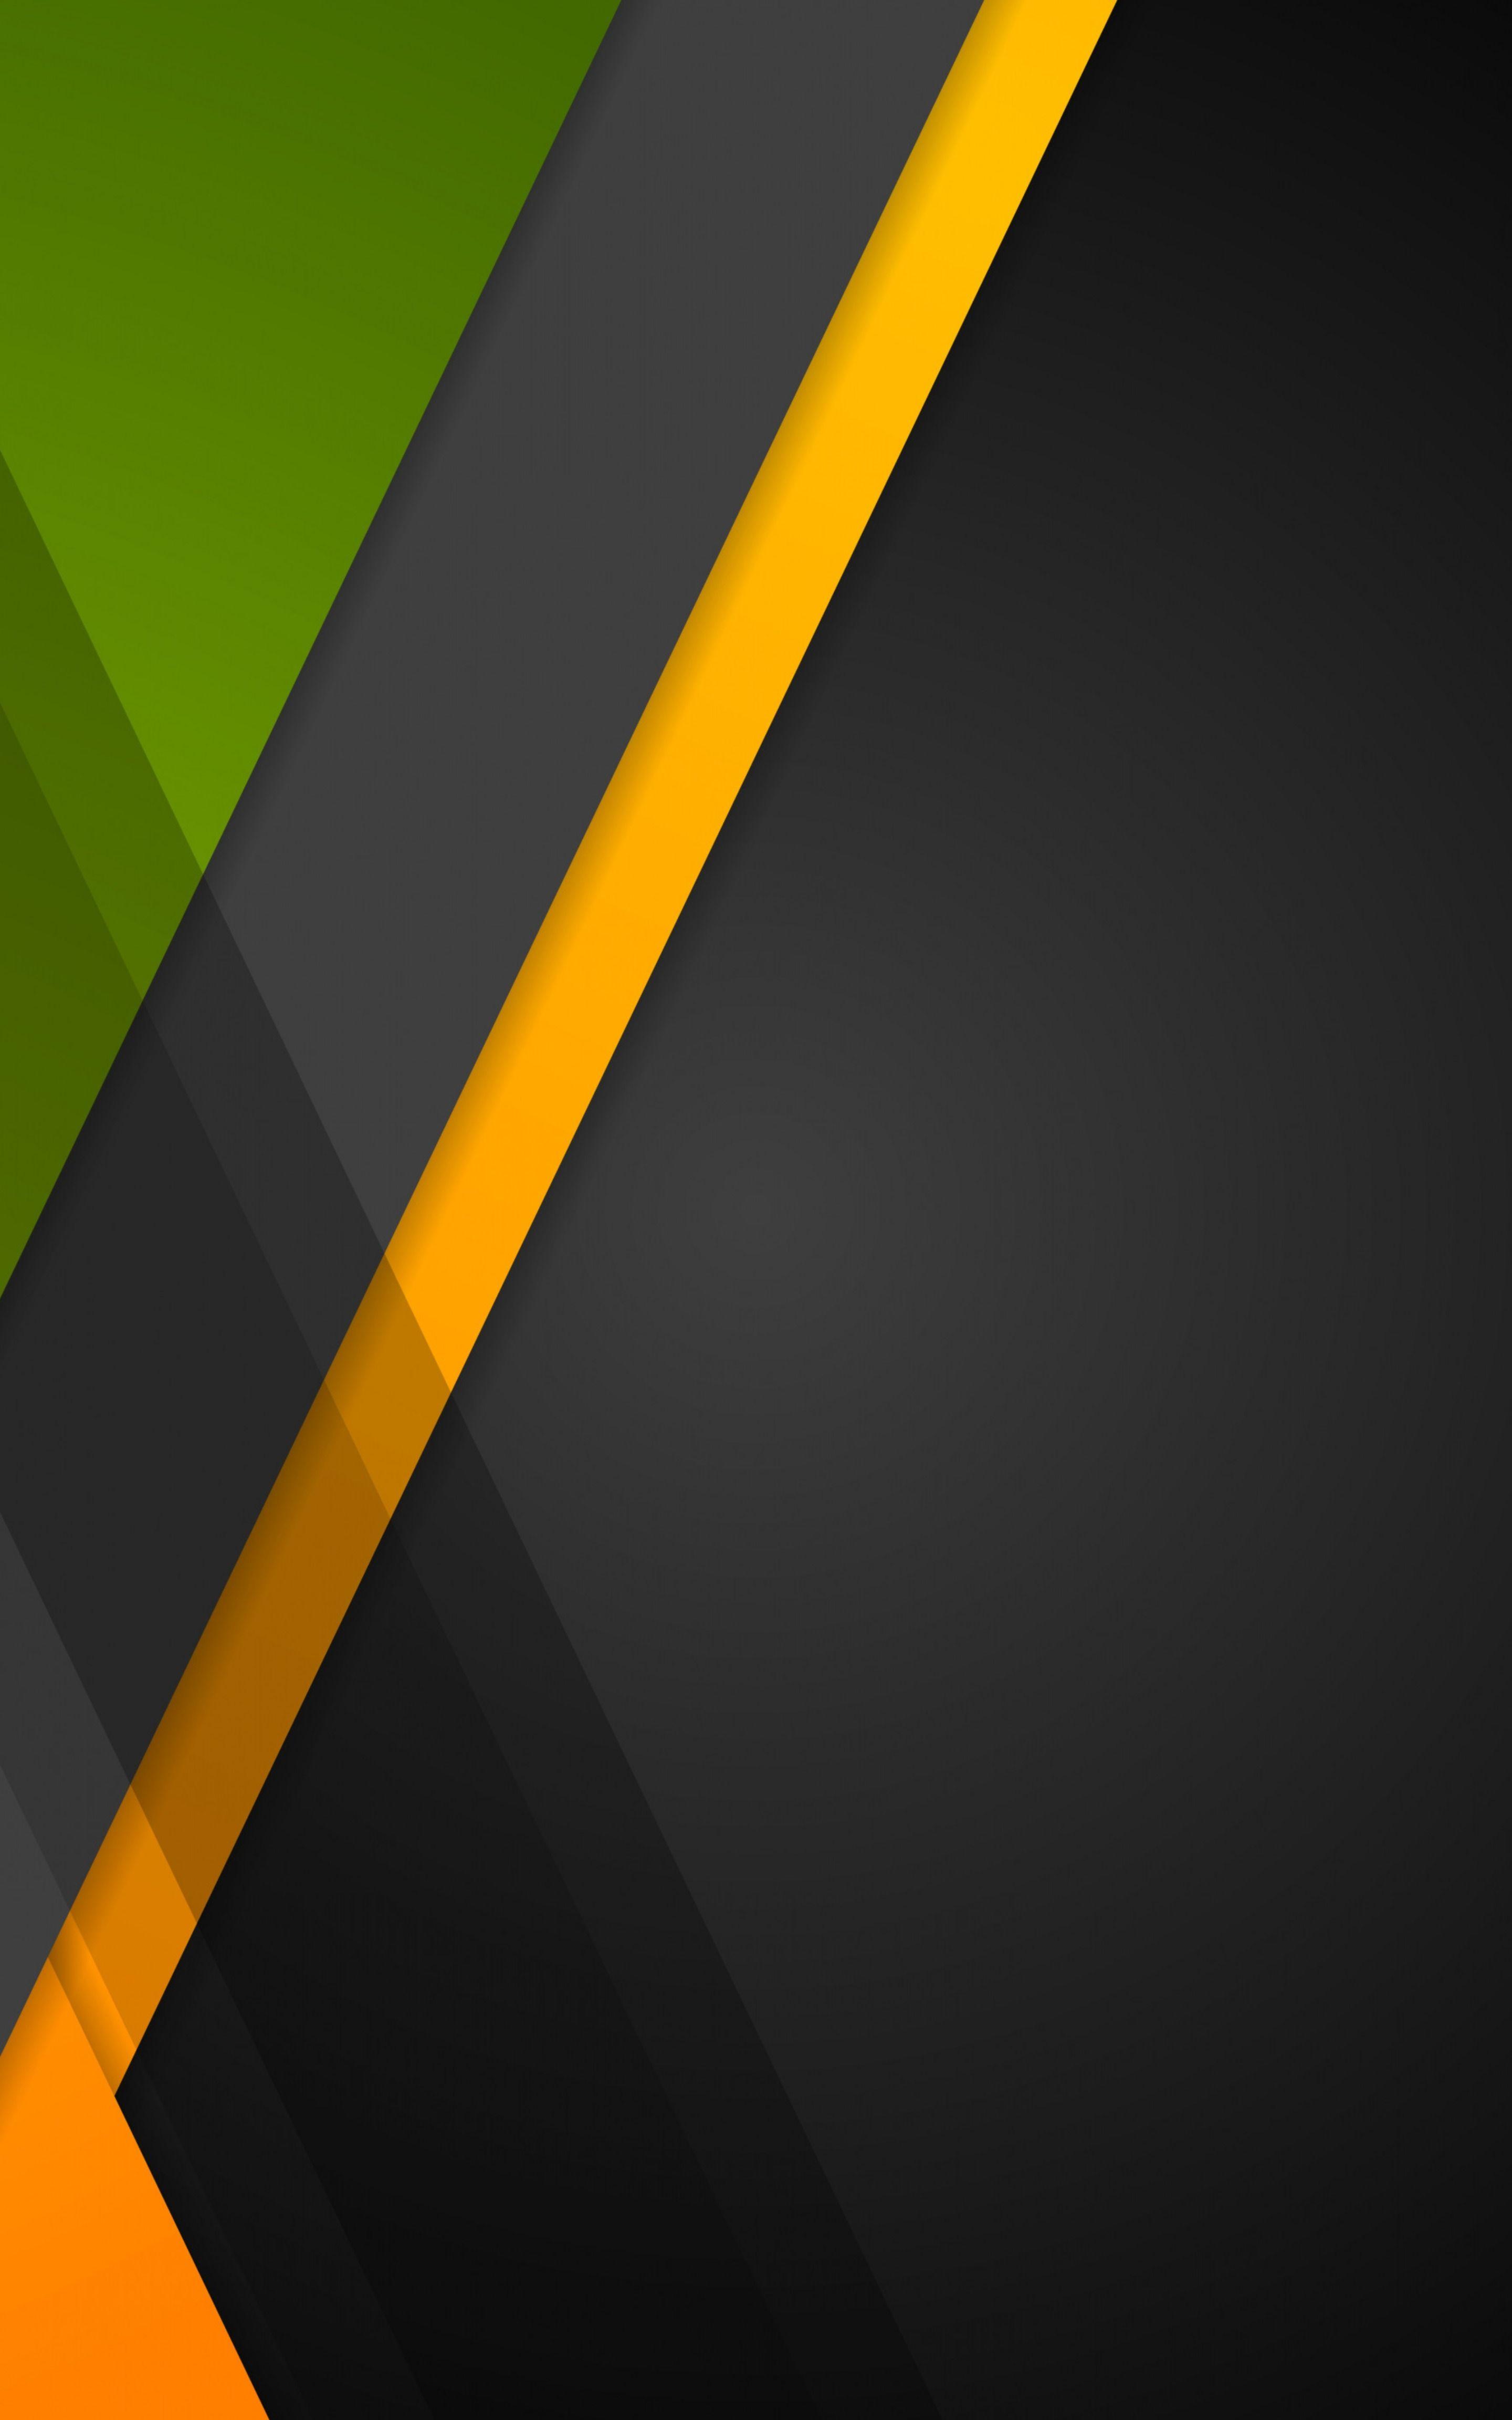 Green Black Orange Background Design Abstract Geometry Ultrahd 4k Hd Phone Wallpaper Geometric In 2020 Hd Phone Wallpapers Orange Background Funny Iphone Wallpaper